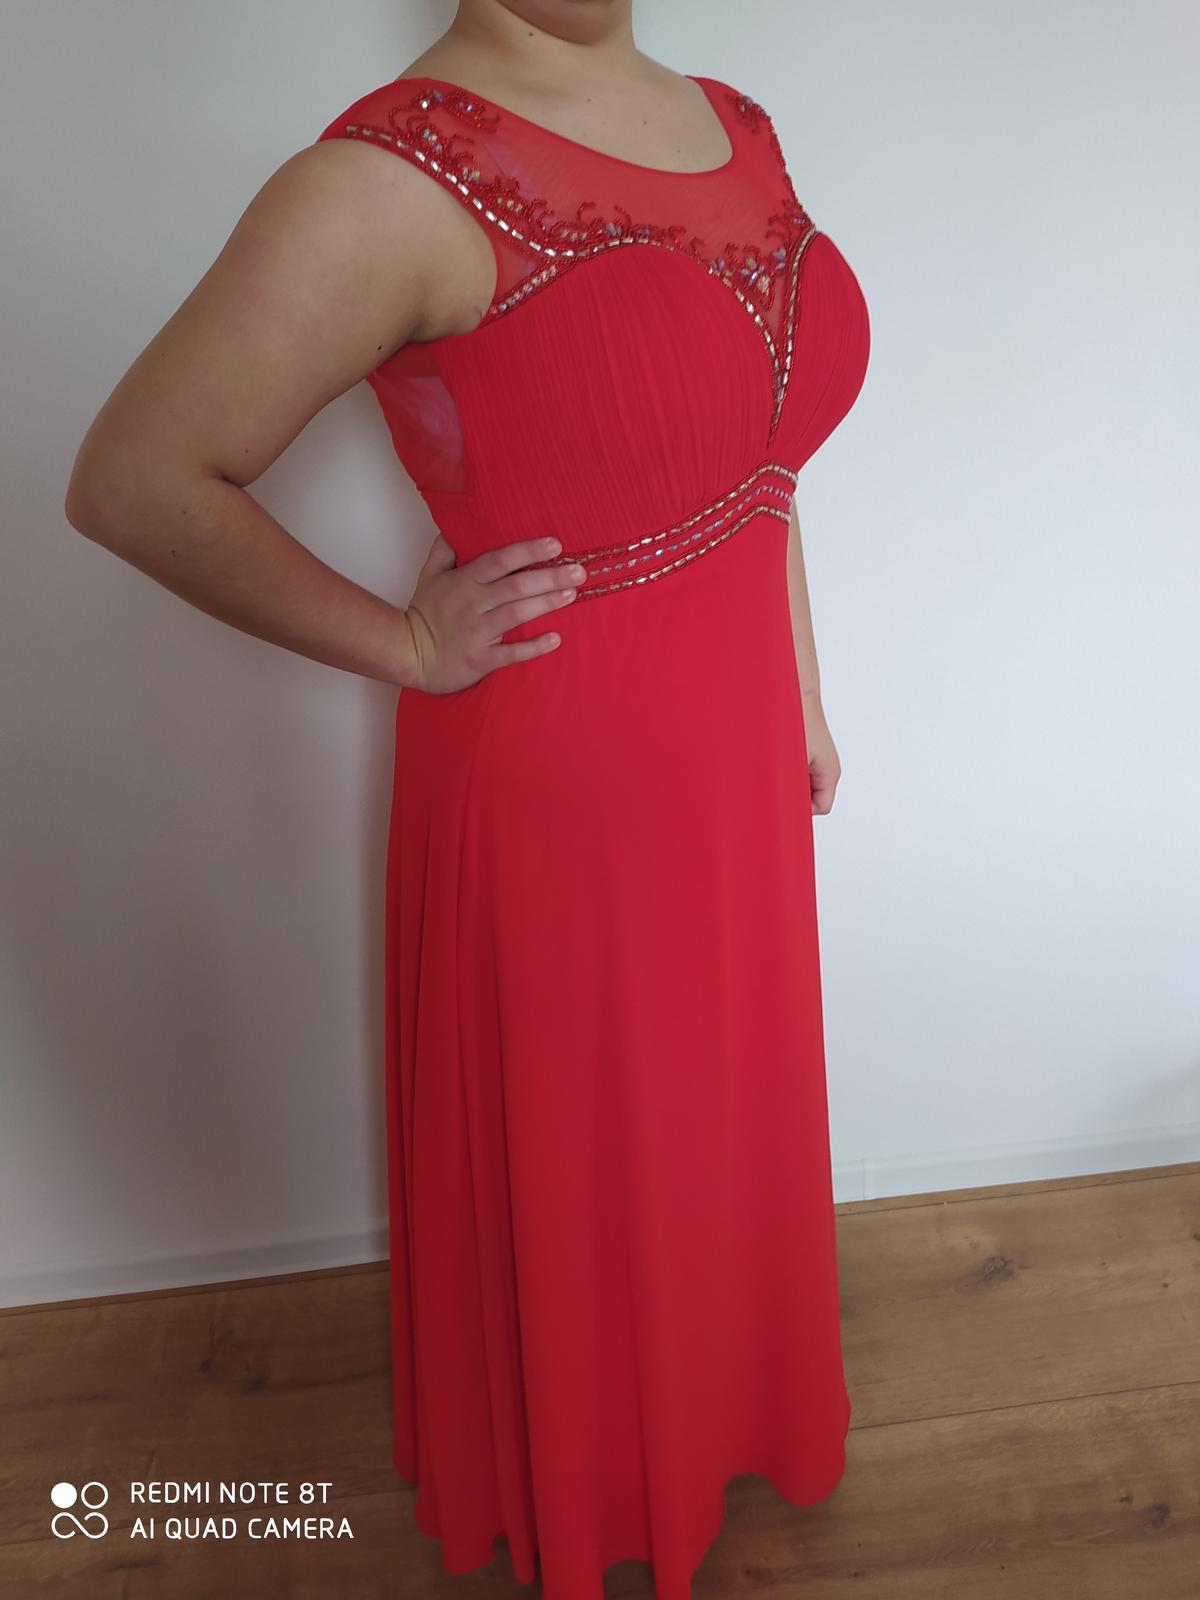 Spoločenské šaty dlhé červené 42 / XL - Obrázok č. 1